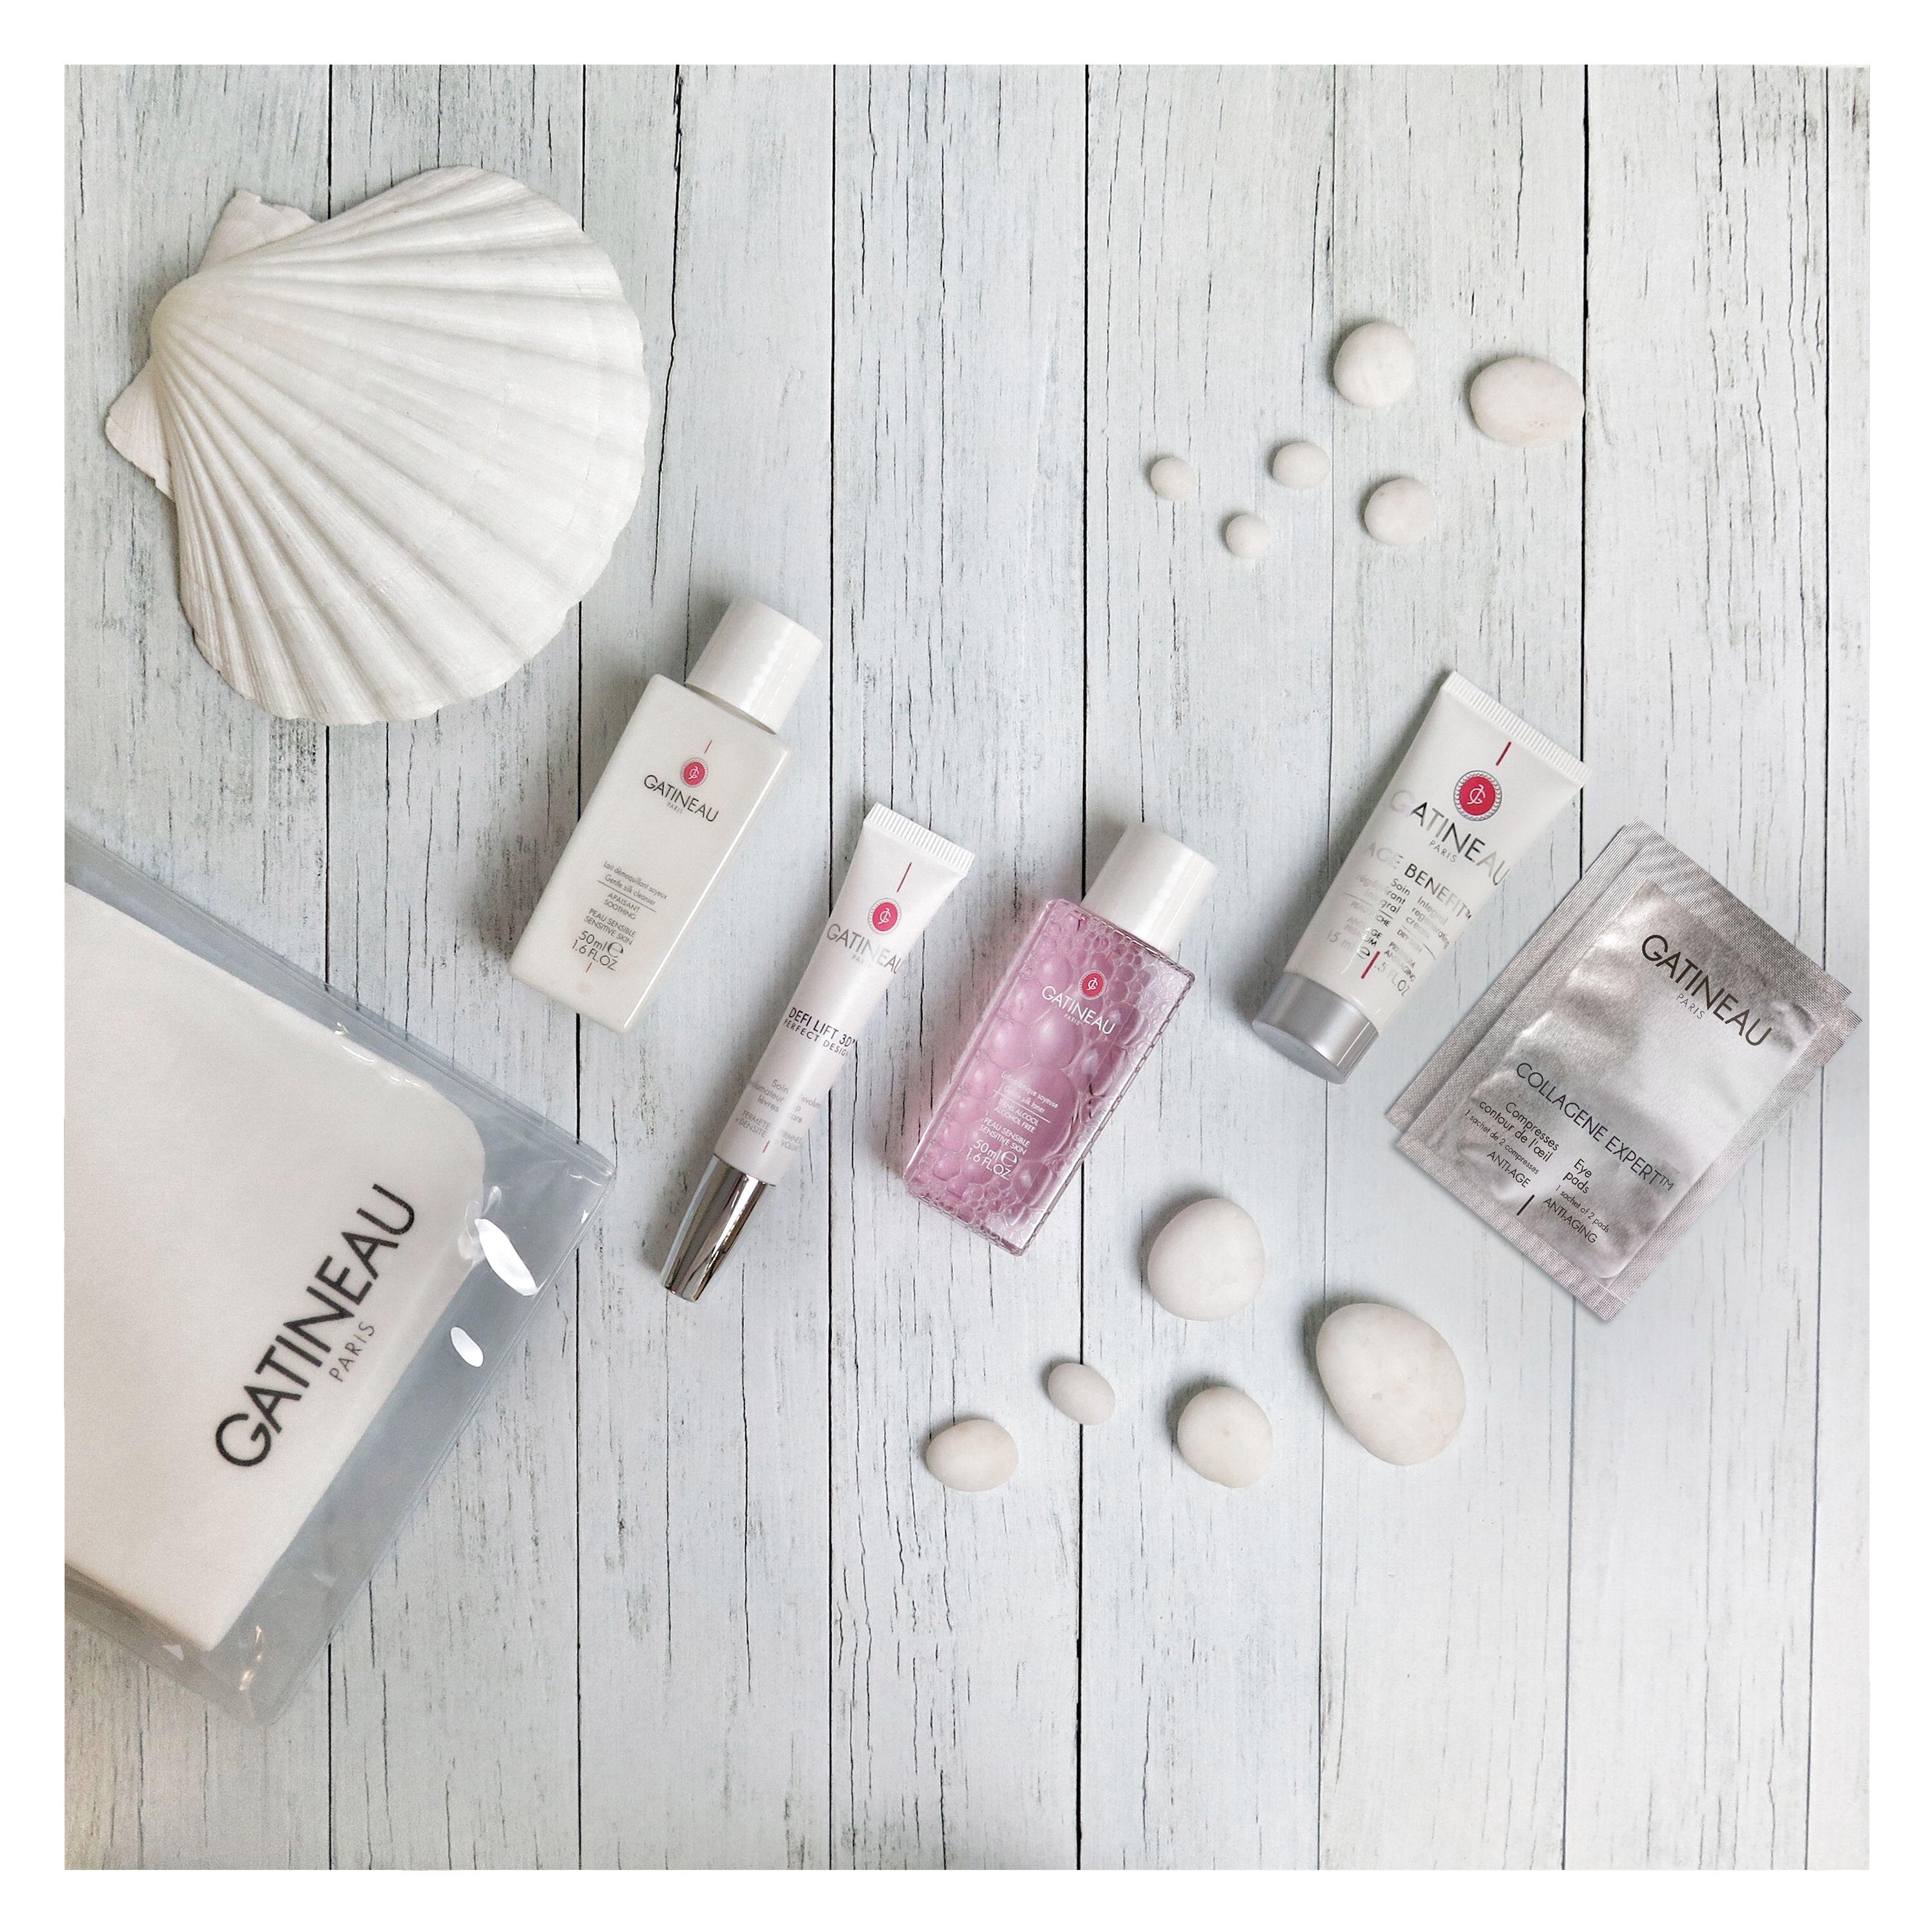 Gentle Silk Cleanser, DefiLift 3D Revolumising Lip Care, Gentle Silk Toner, Age Benefit Integral Regenerating Cream and Collagene Expert Eye Pads